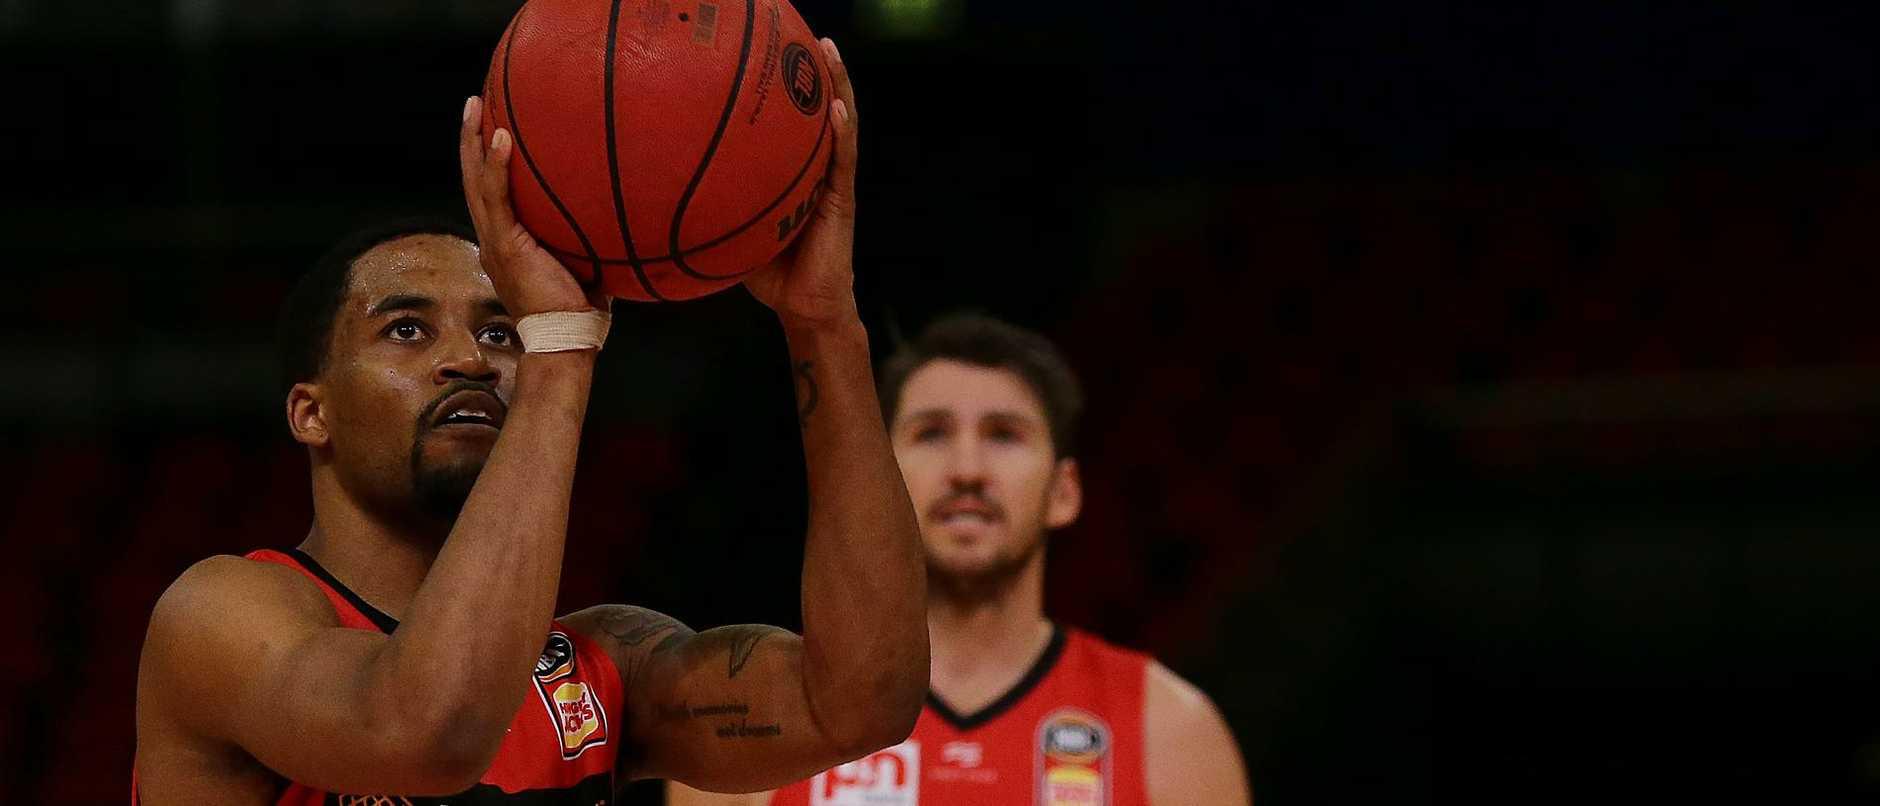 NBL Grand Final: Game 3 - Sydney v Perth